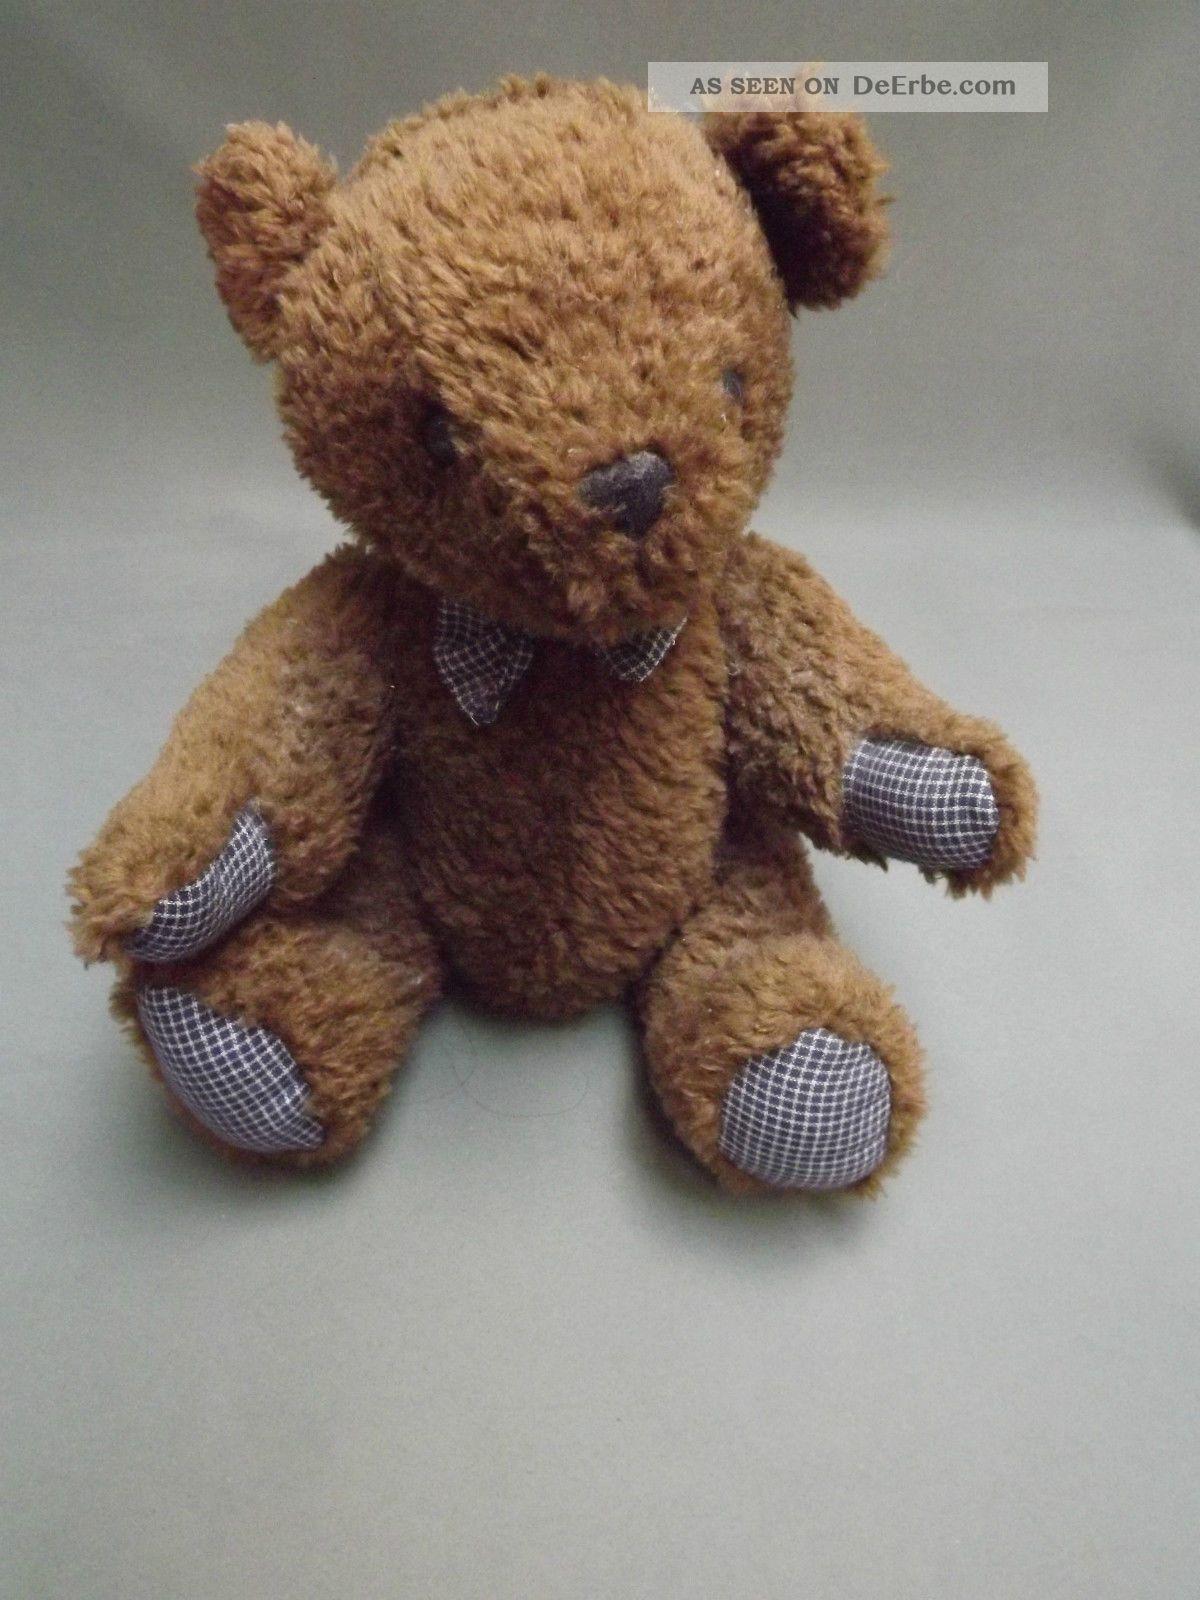 Alter Teddybär,  Braun,  32cm,  Antik?,  Sammlungsauflösung (952) Stofftiere & Teddybären Bild